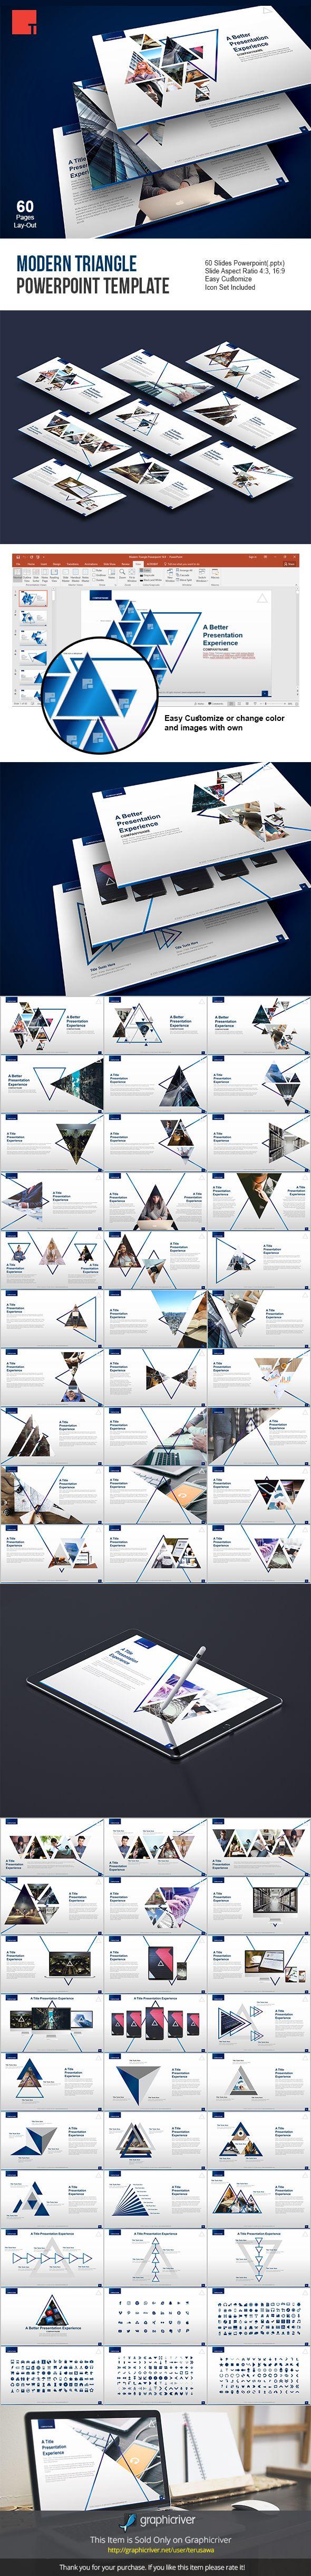 1816 best powerpoint template images on pinterest toneelgroepblik Image collections